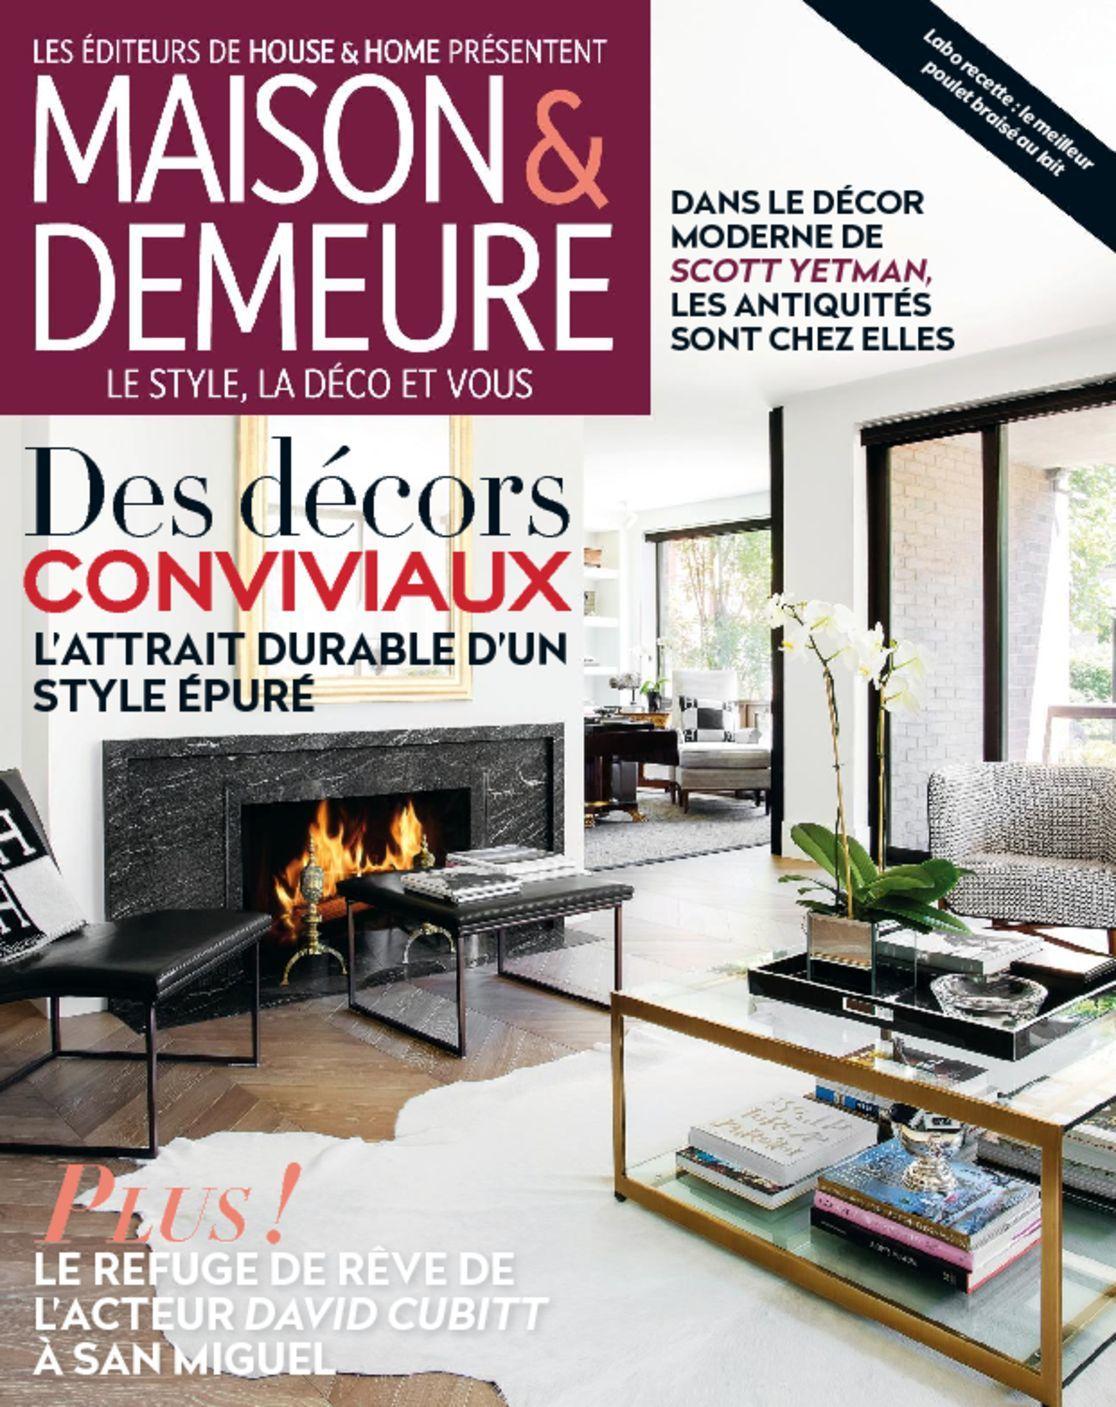 Maison demeure digital magazine - Maison demeure magazine ...